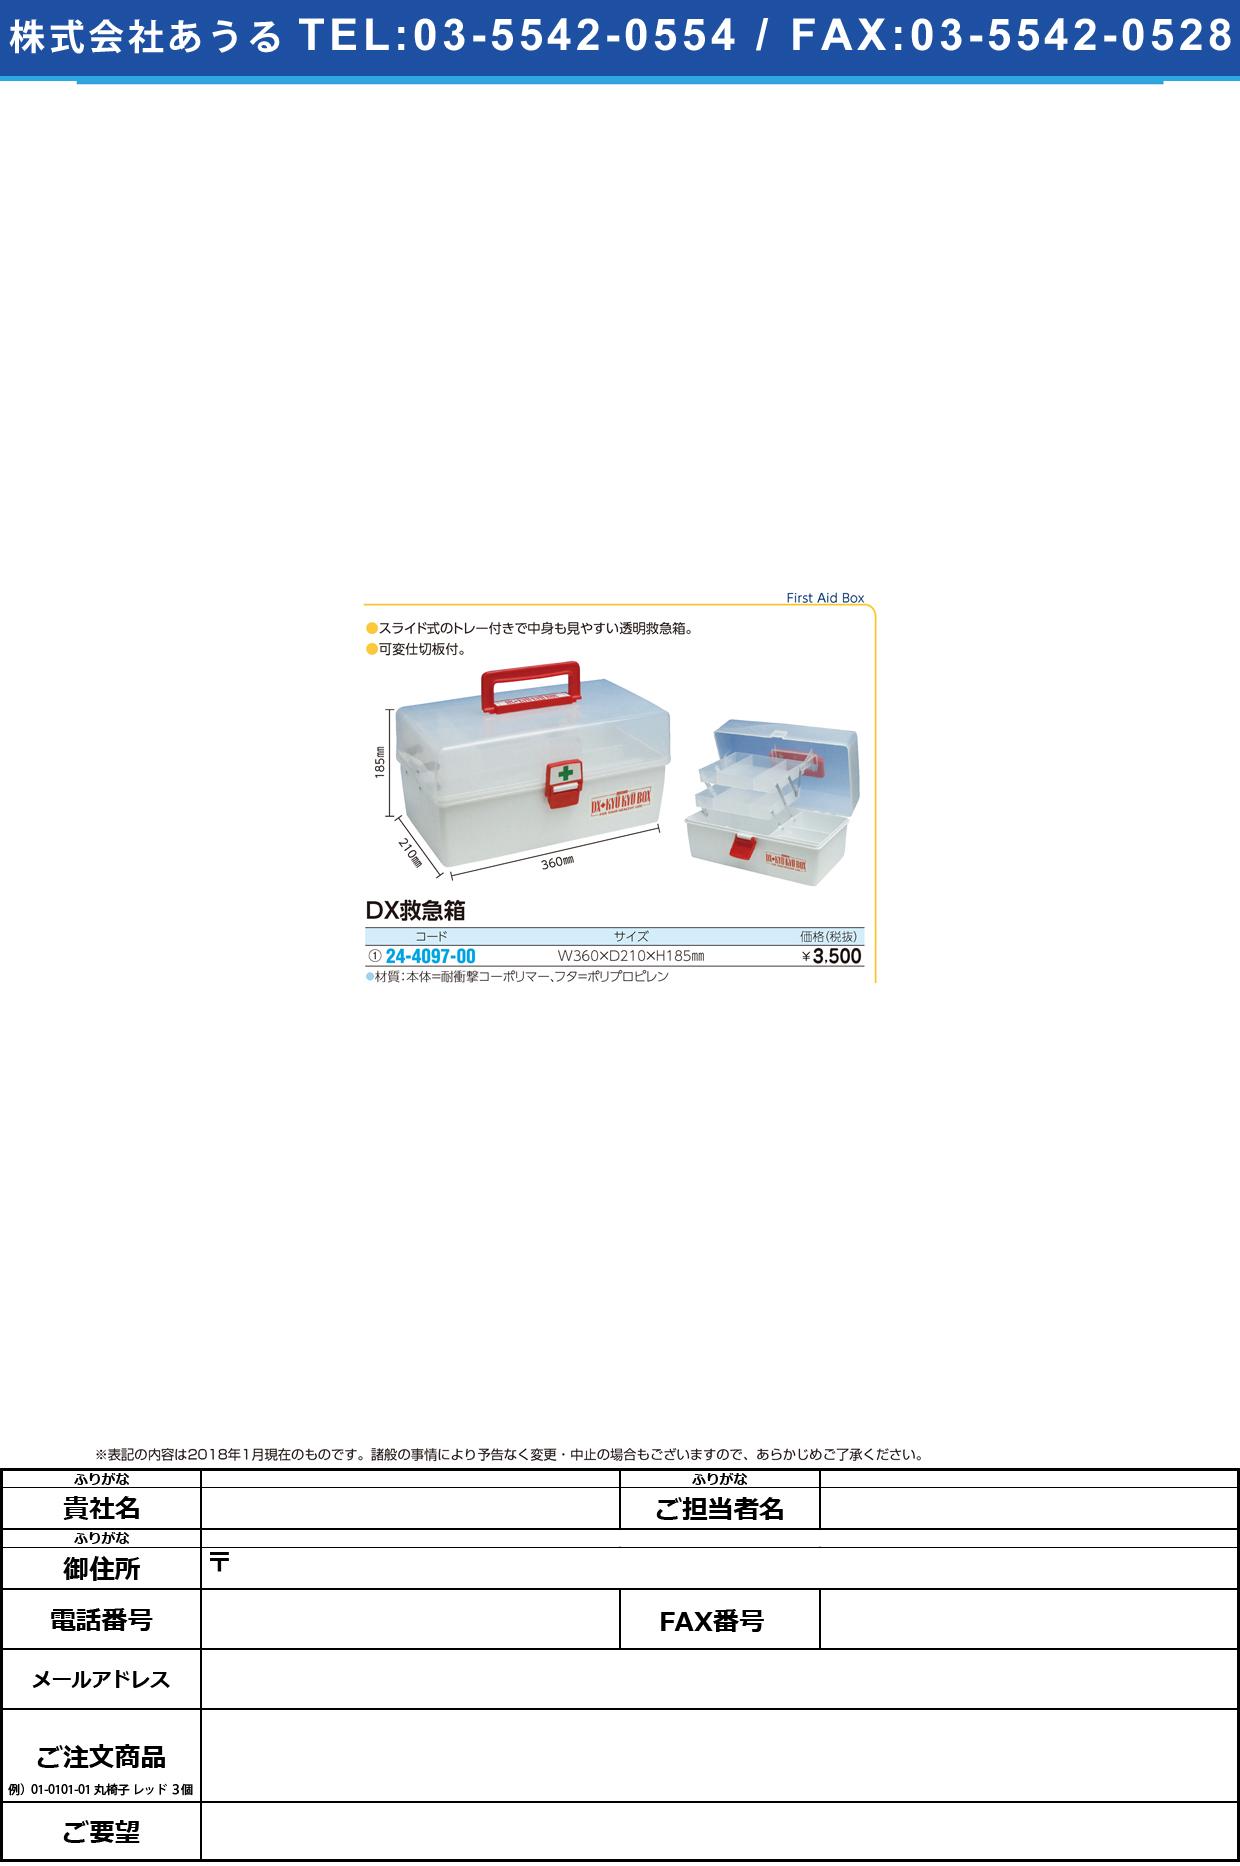 (24-4097-00)DX救急箱 360X210X185MM DXキュウキュウバコ【1個単位】【2018年カタログ商品】